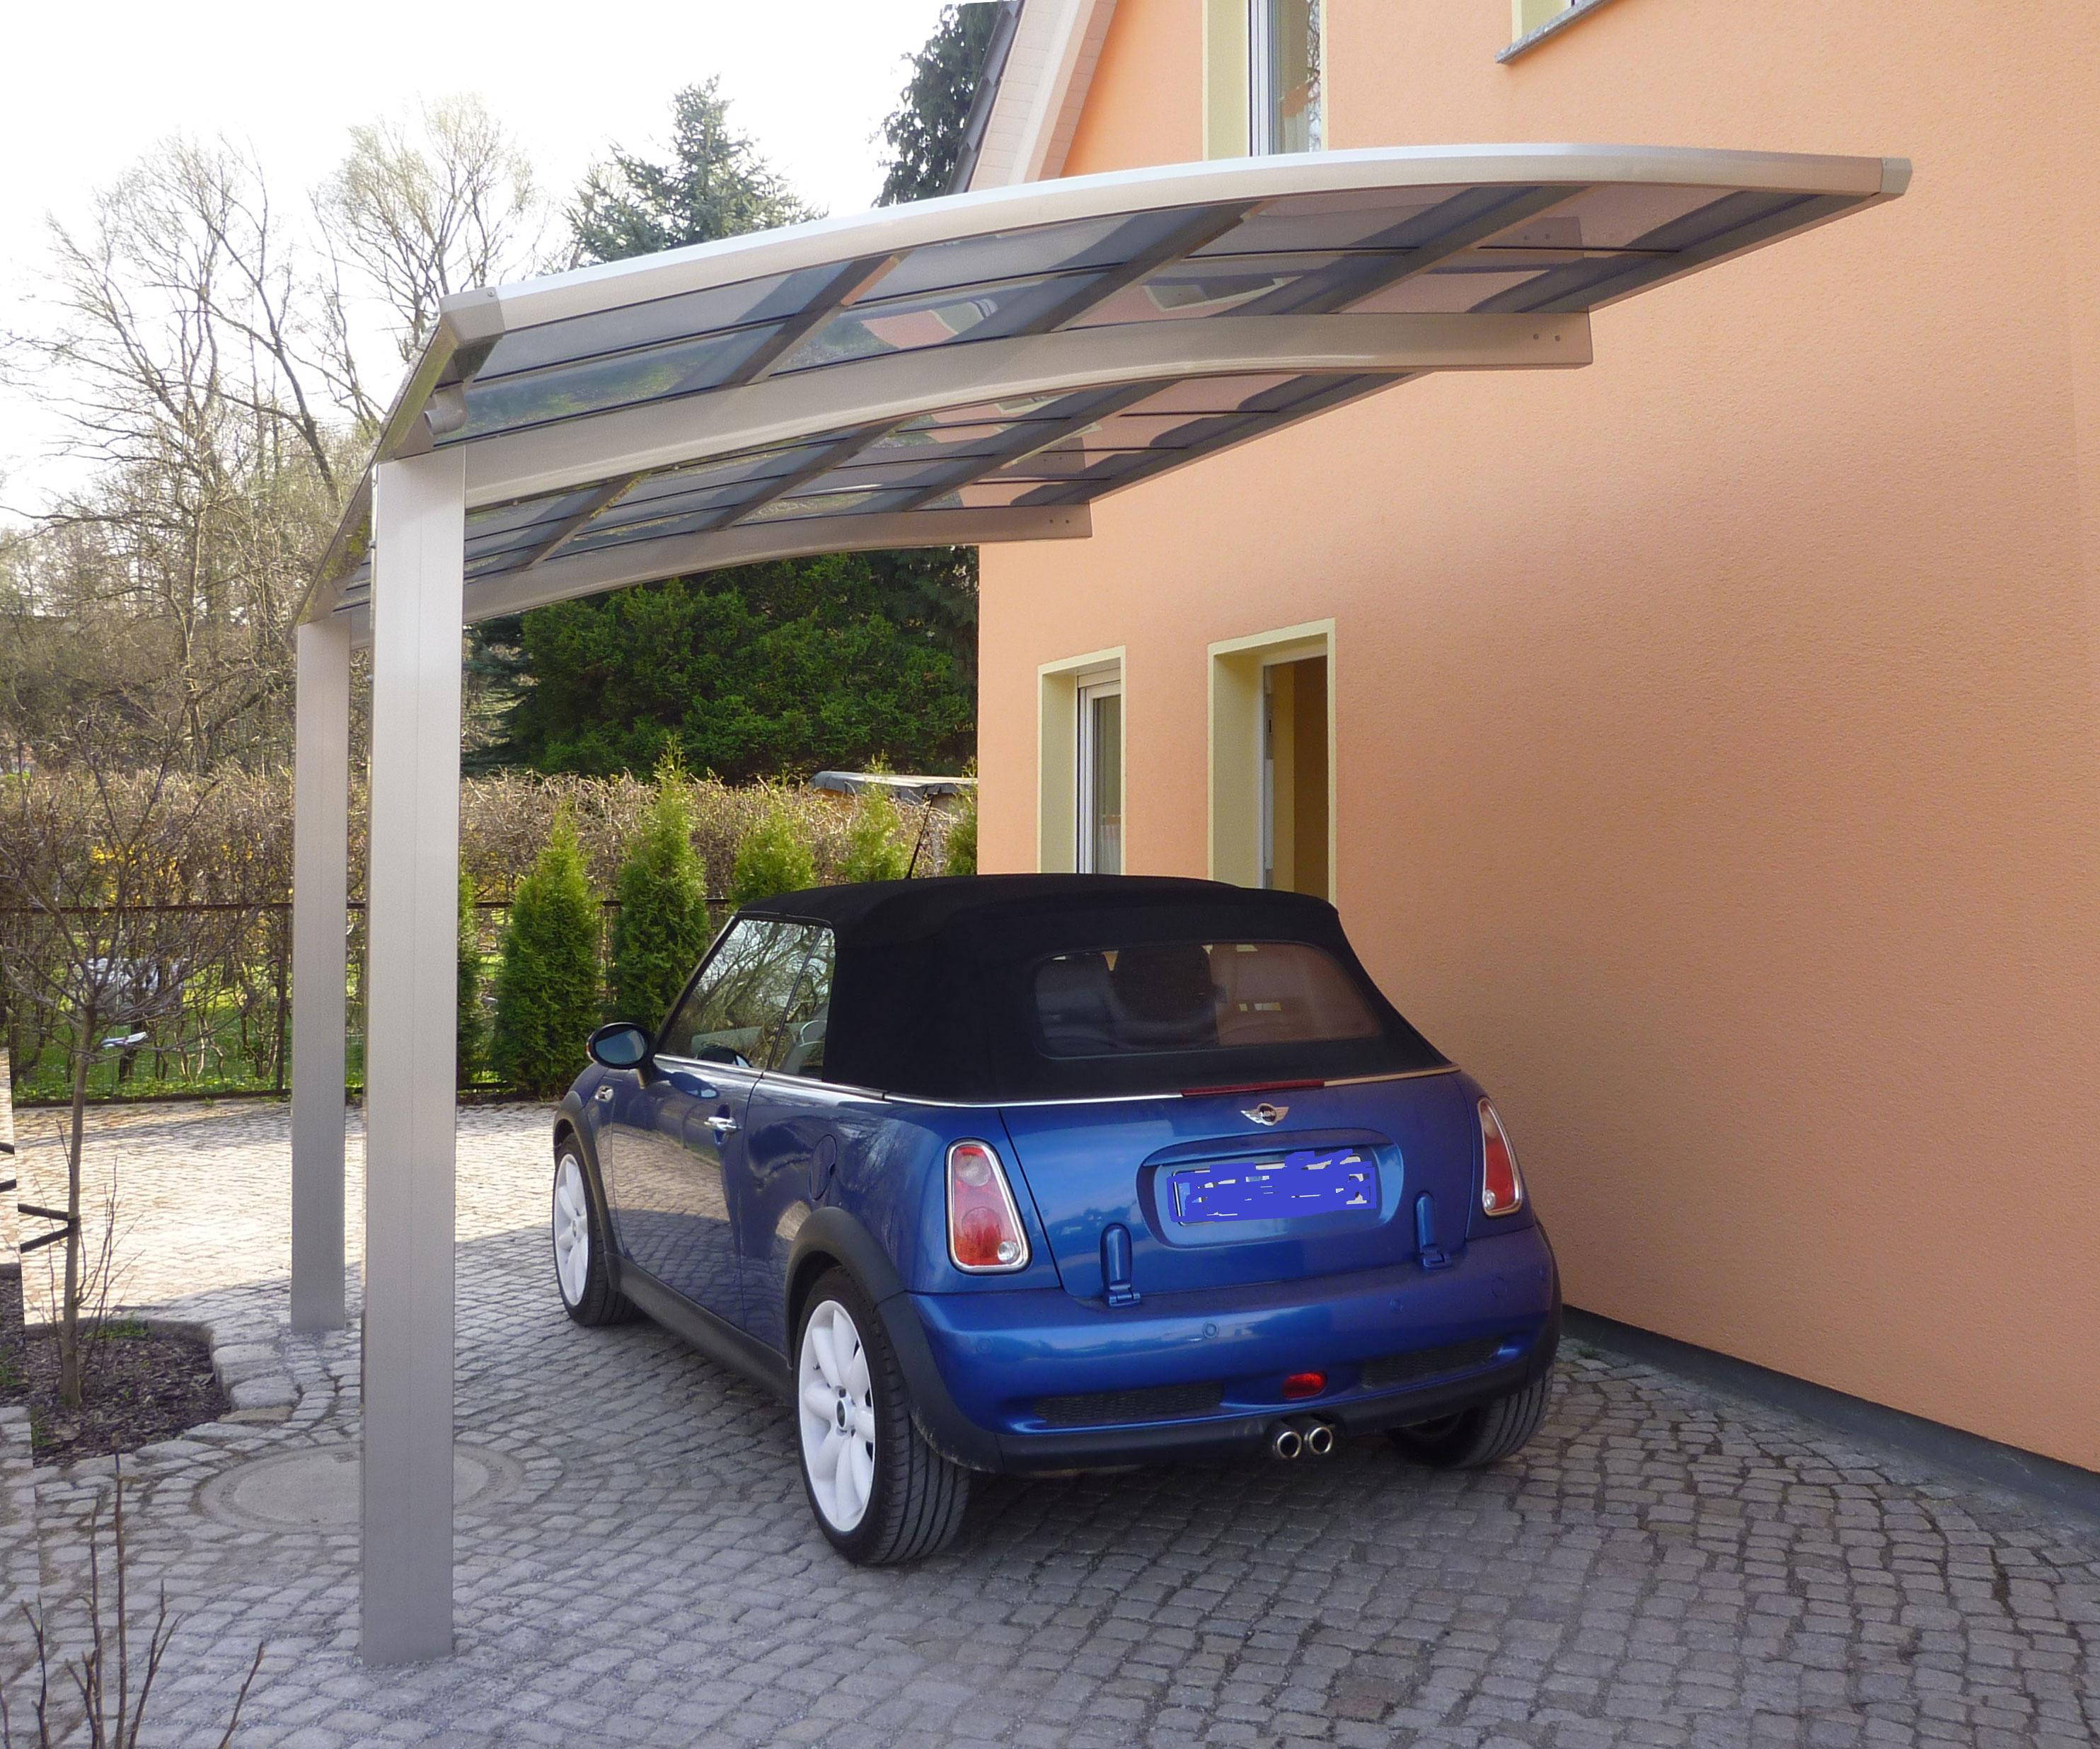 Carport XIMAX Portoforte Alu Typ 60 Standard ES 495x270x248cm Bild 2